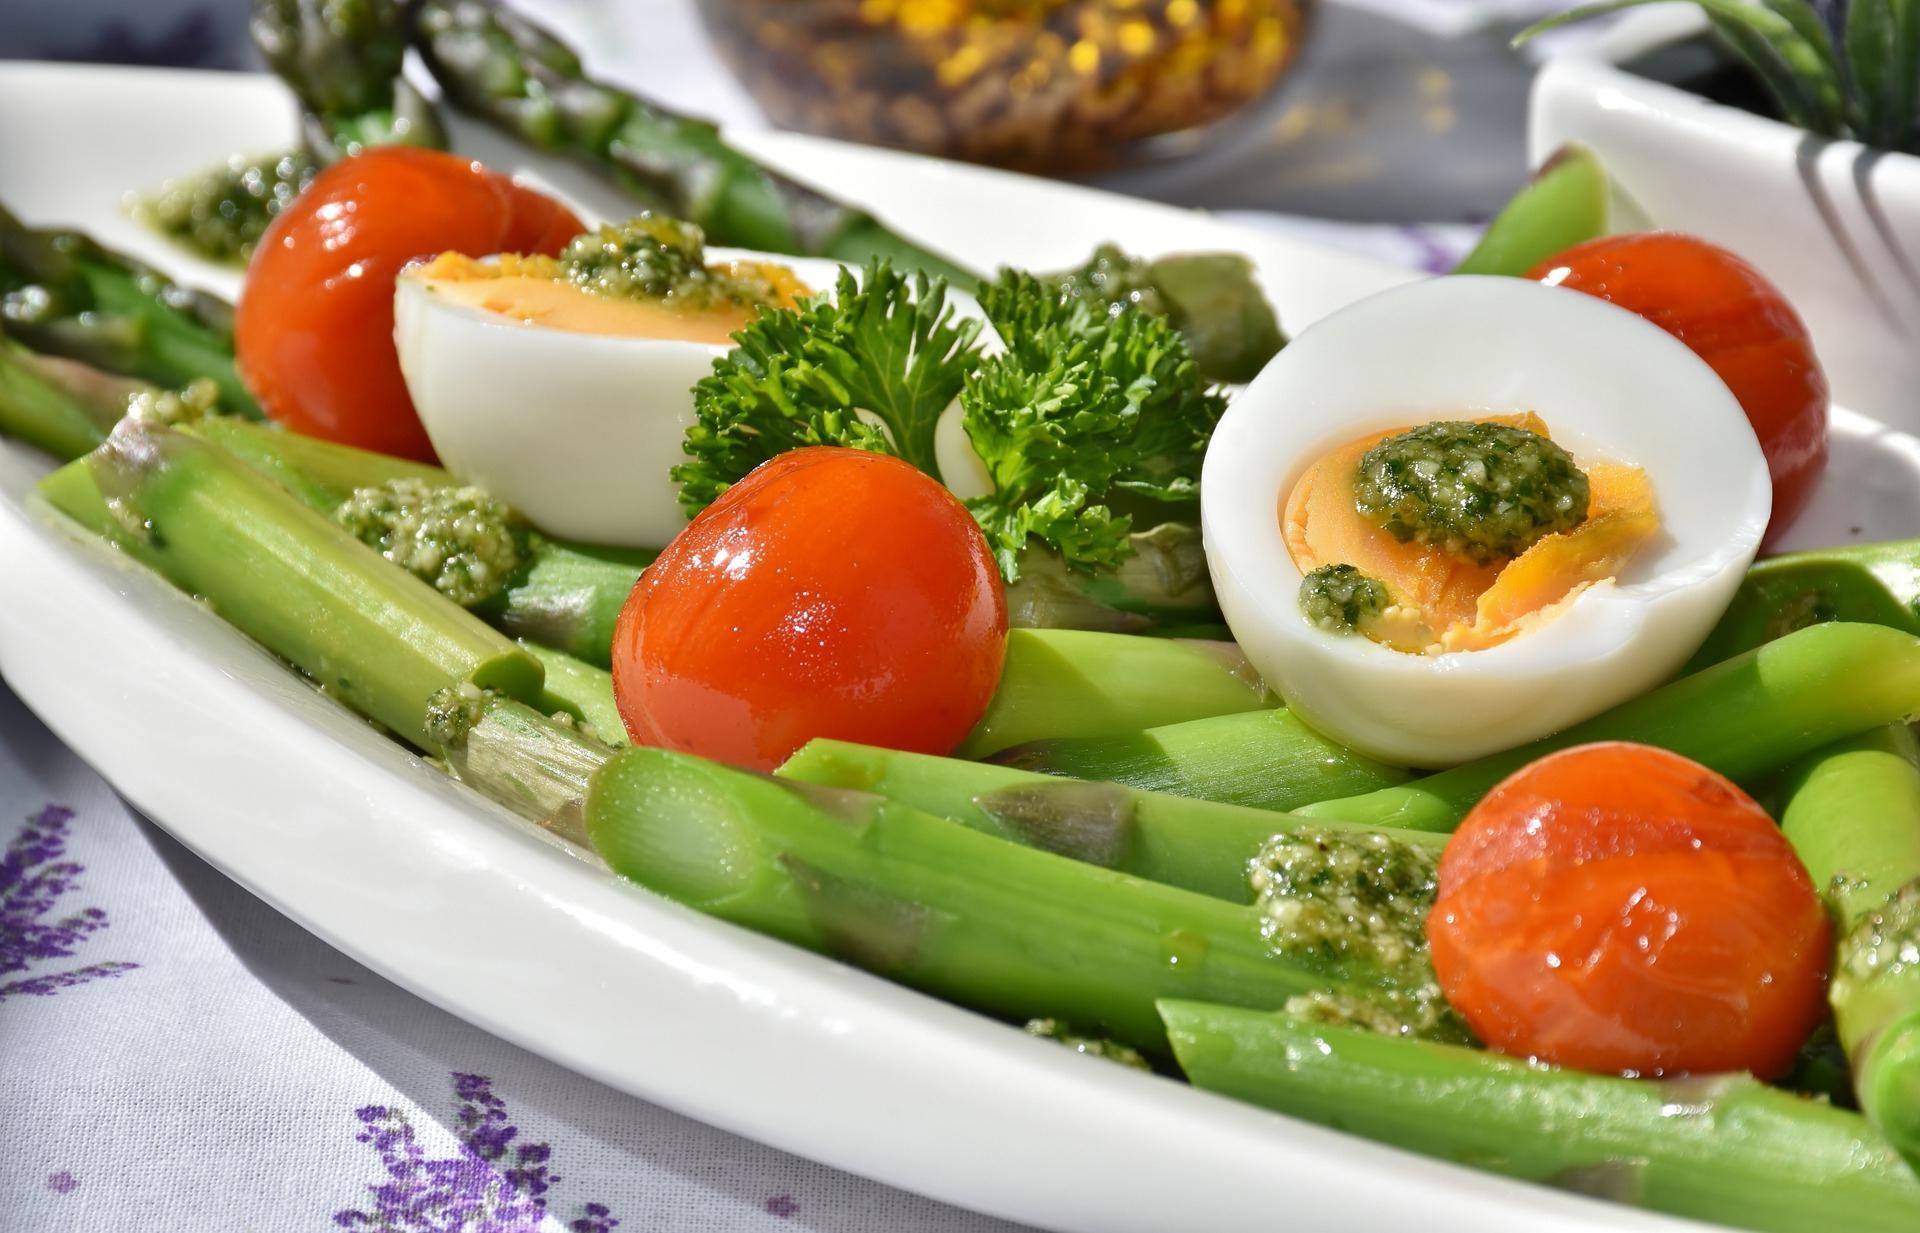 Alimentos para bajar la tensi n arterial alta bonom dicoblog - Alimentos prohibidos con hemorroides ...